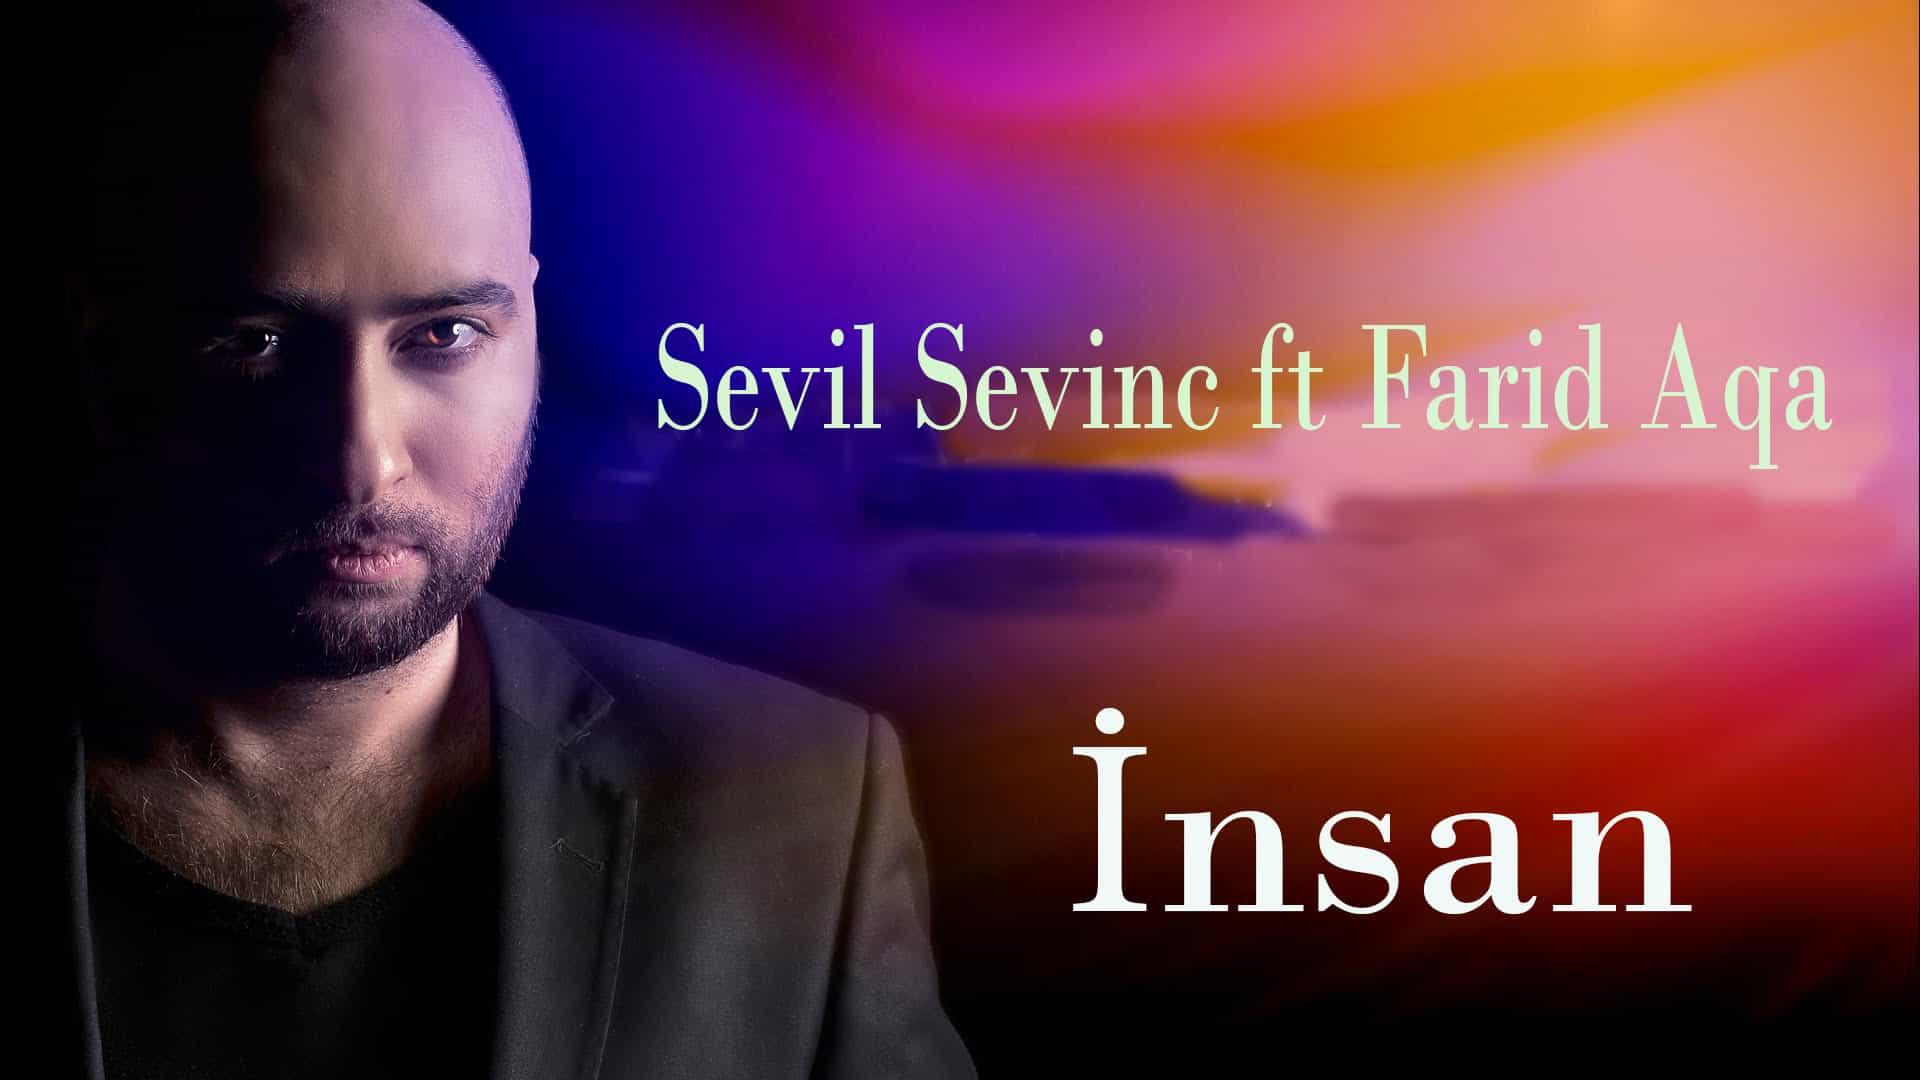 Sevil Sevinc